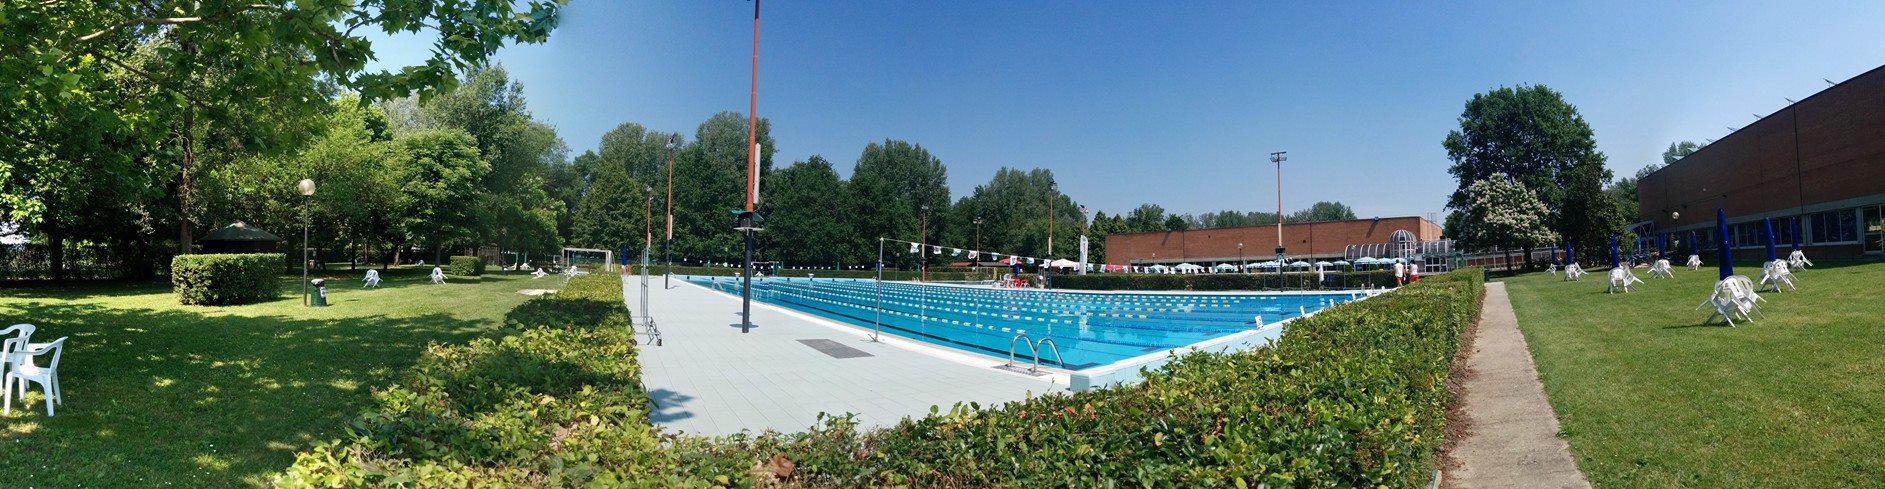 Idropolis piscine s r l - Piscine san marco ...